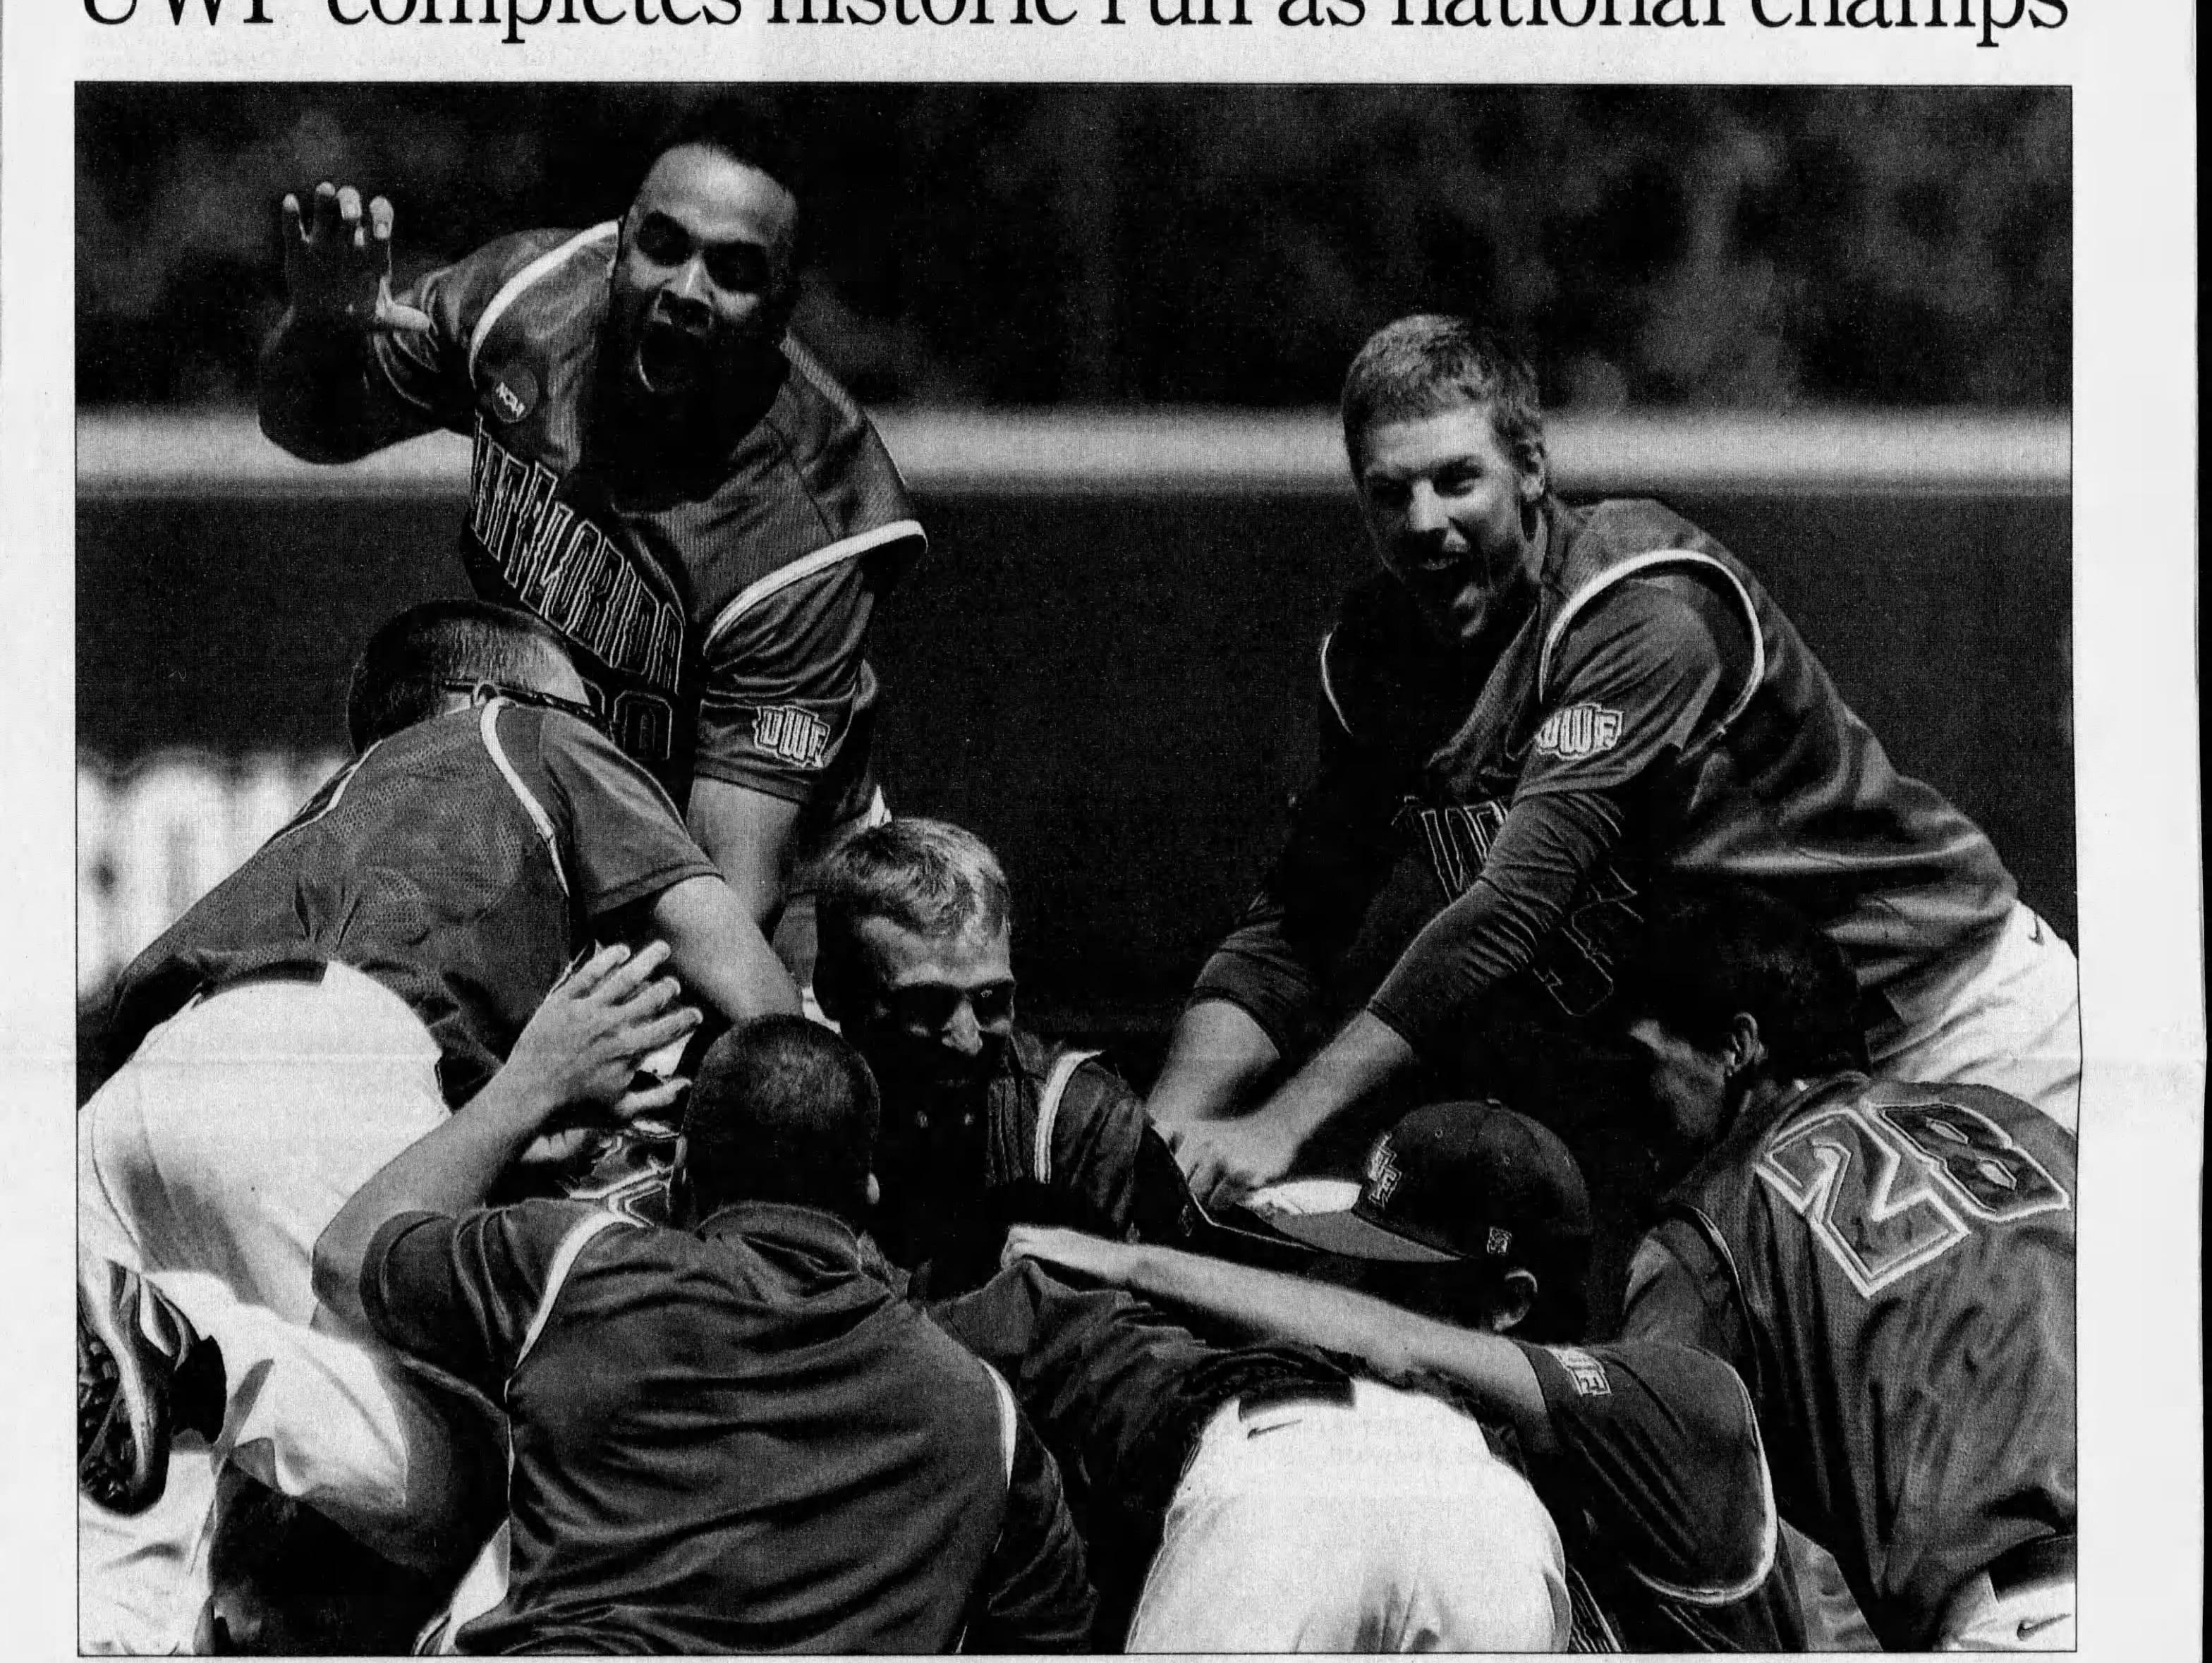 May/June 2011: UWF baseball wins NCAA D2 national championship.